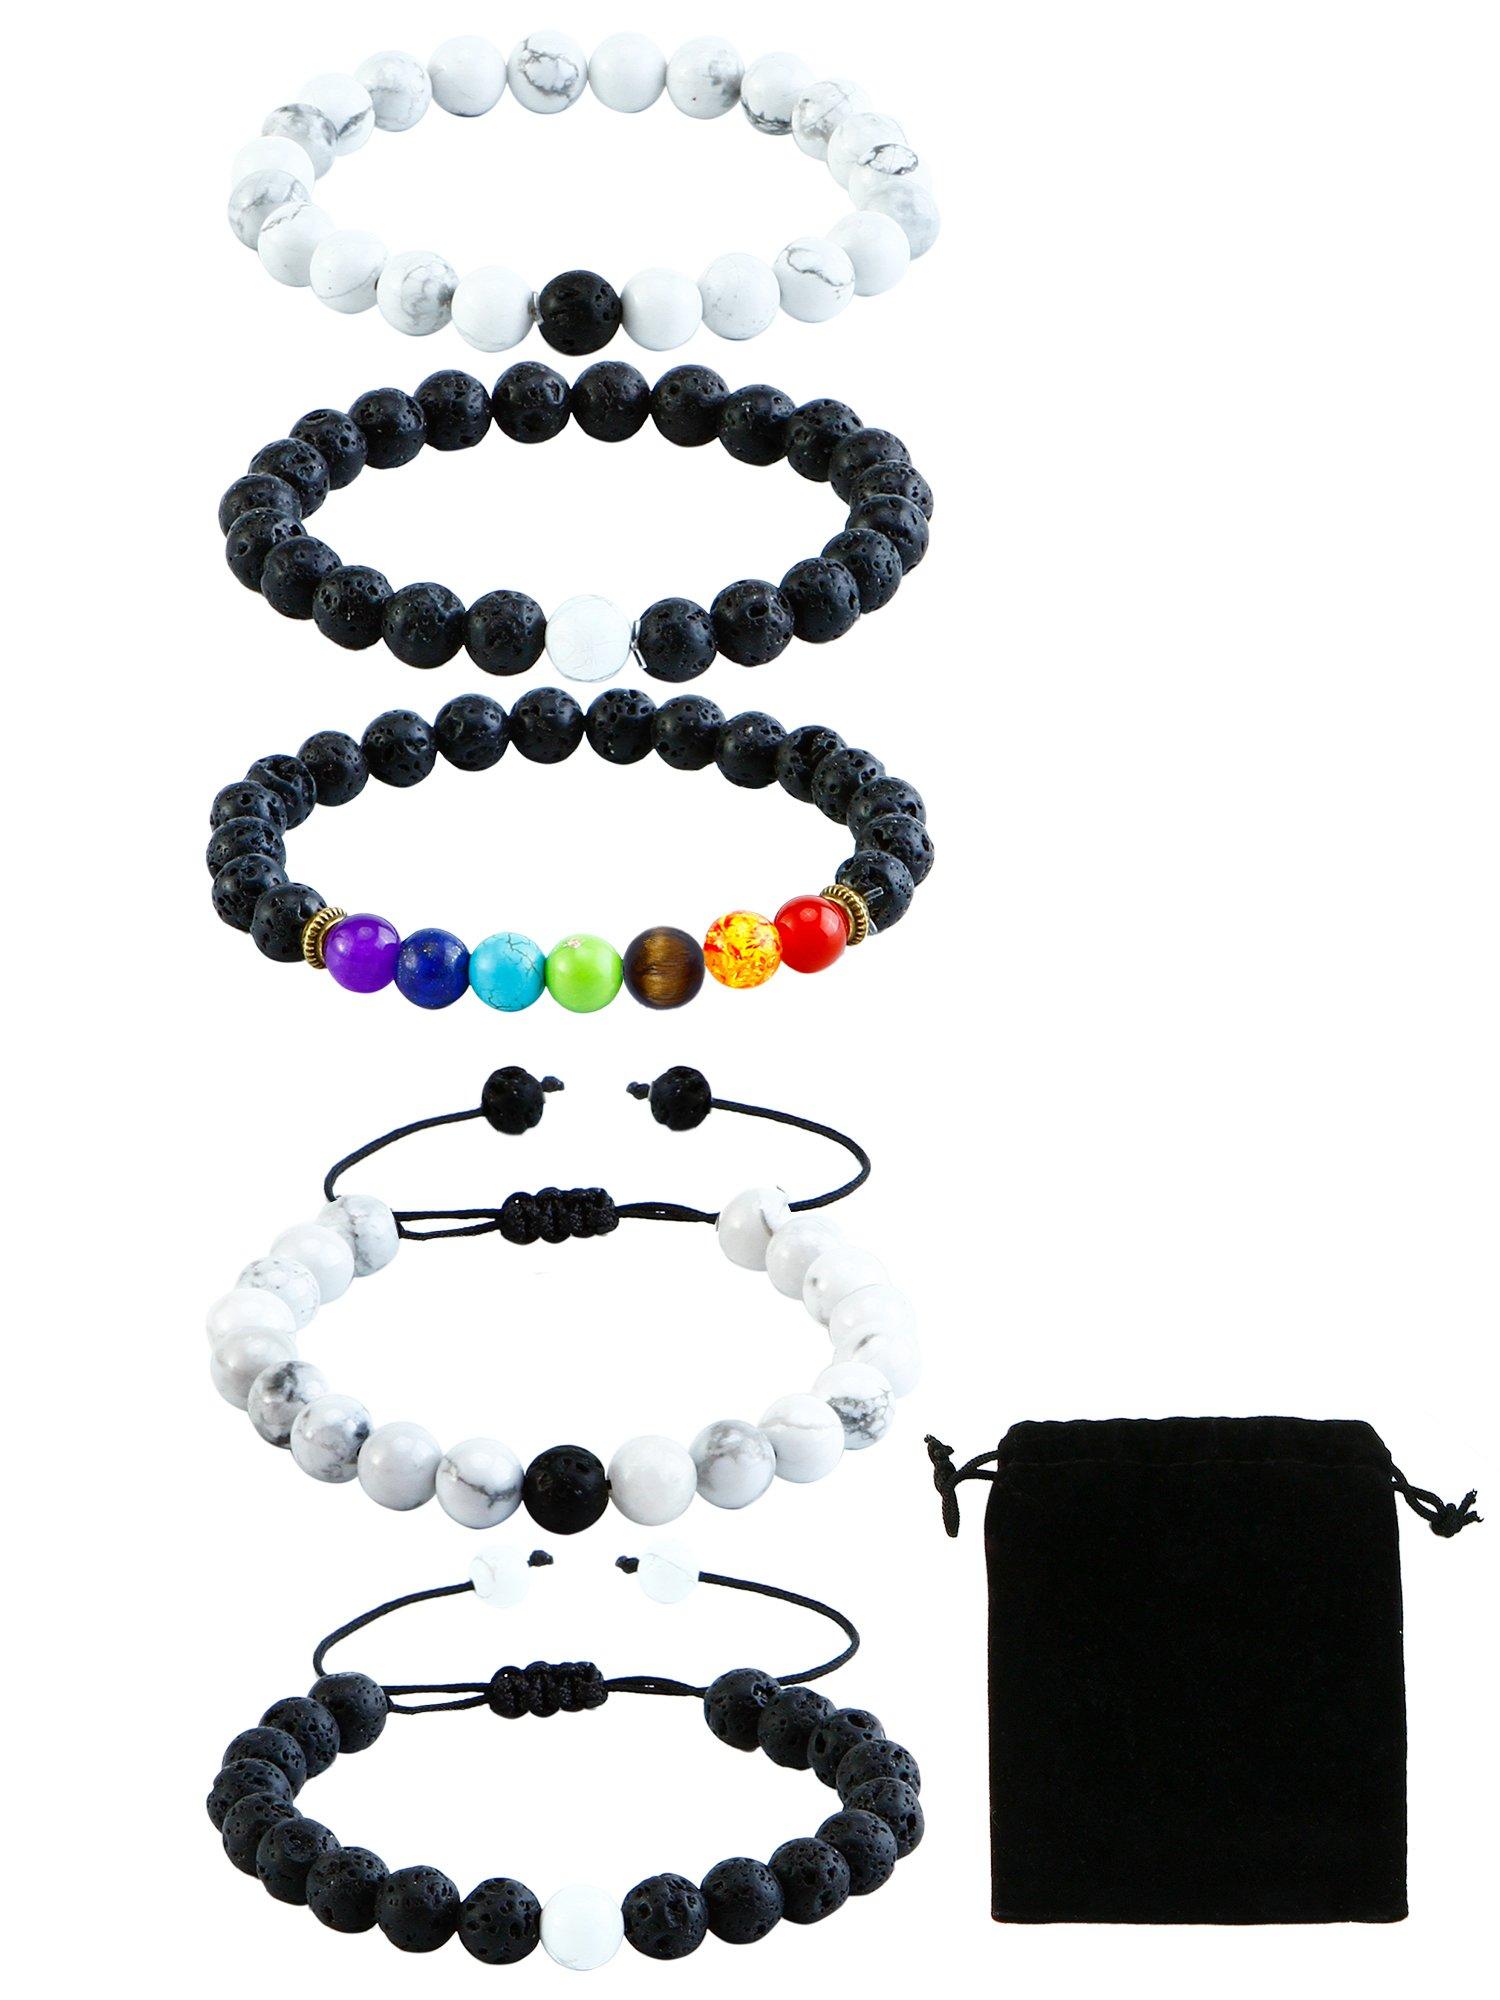 Coobey 5 Pieces Howlite Lava Rock Stones Bracelets Chakras Diffuser Essential Oil Diffuser Bracelets Natural Stones Yoga Beads Bracelet Bangle with Drawstring Bag for Couples